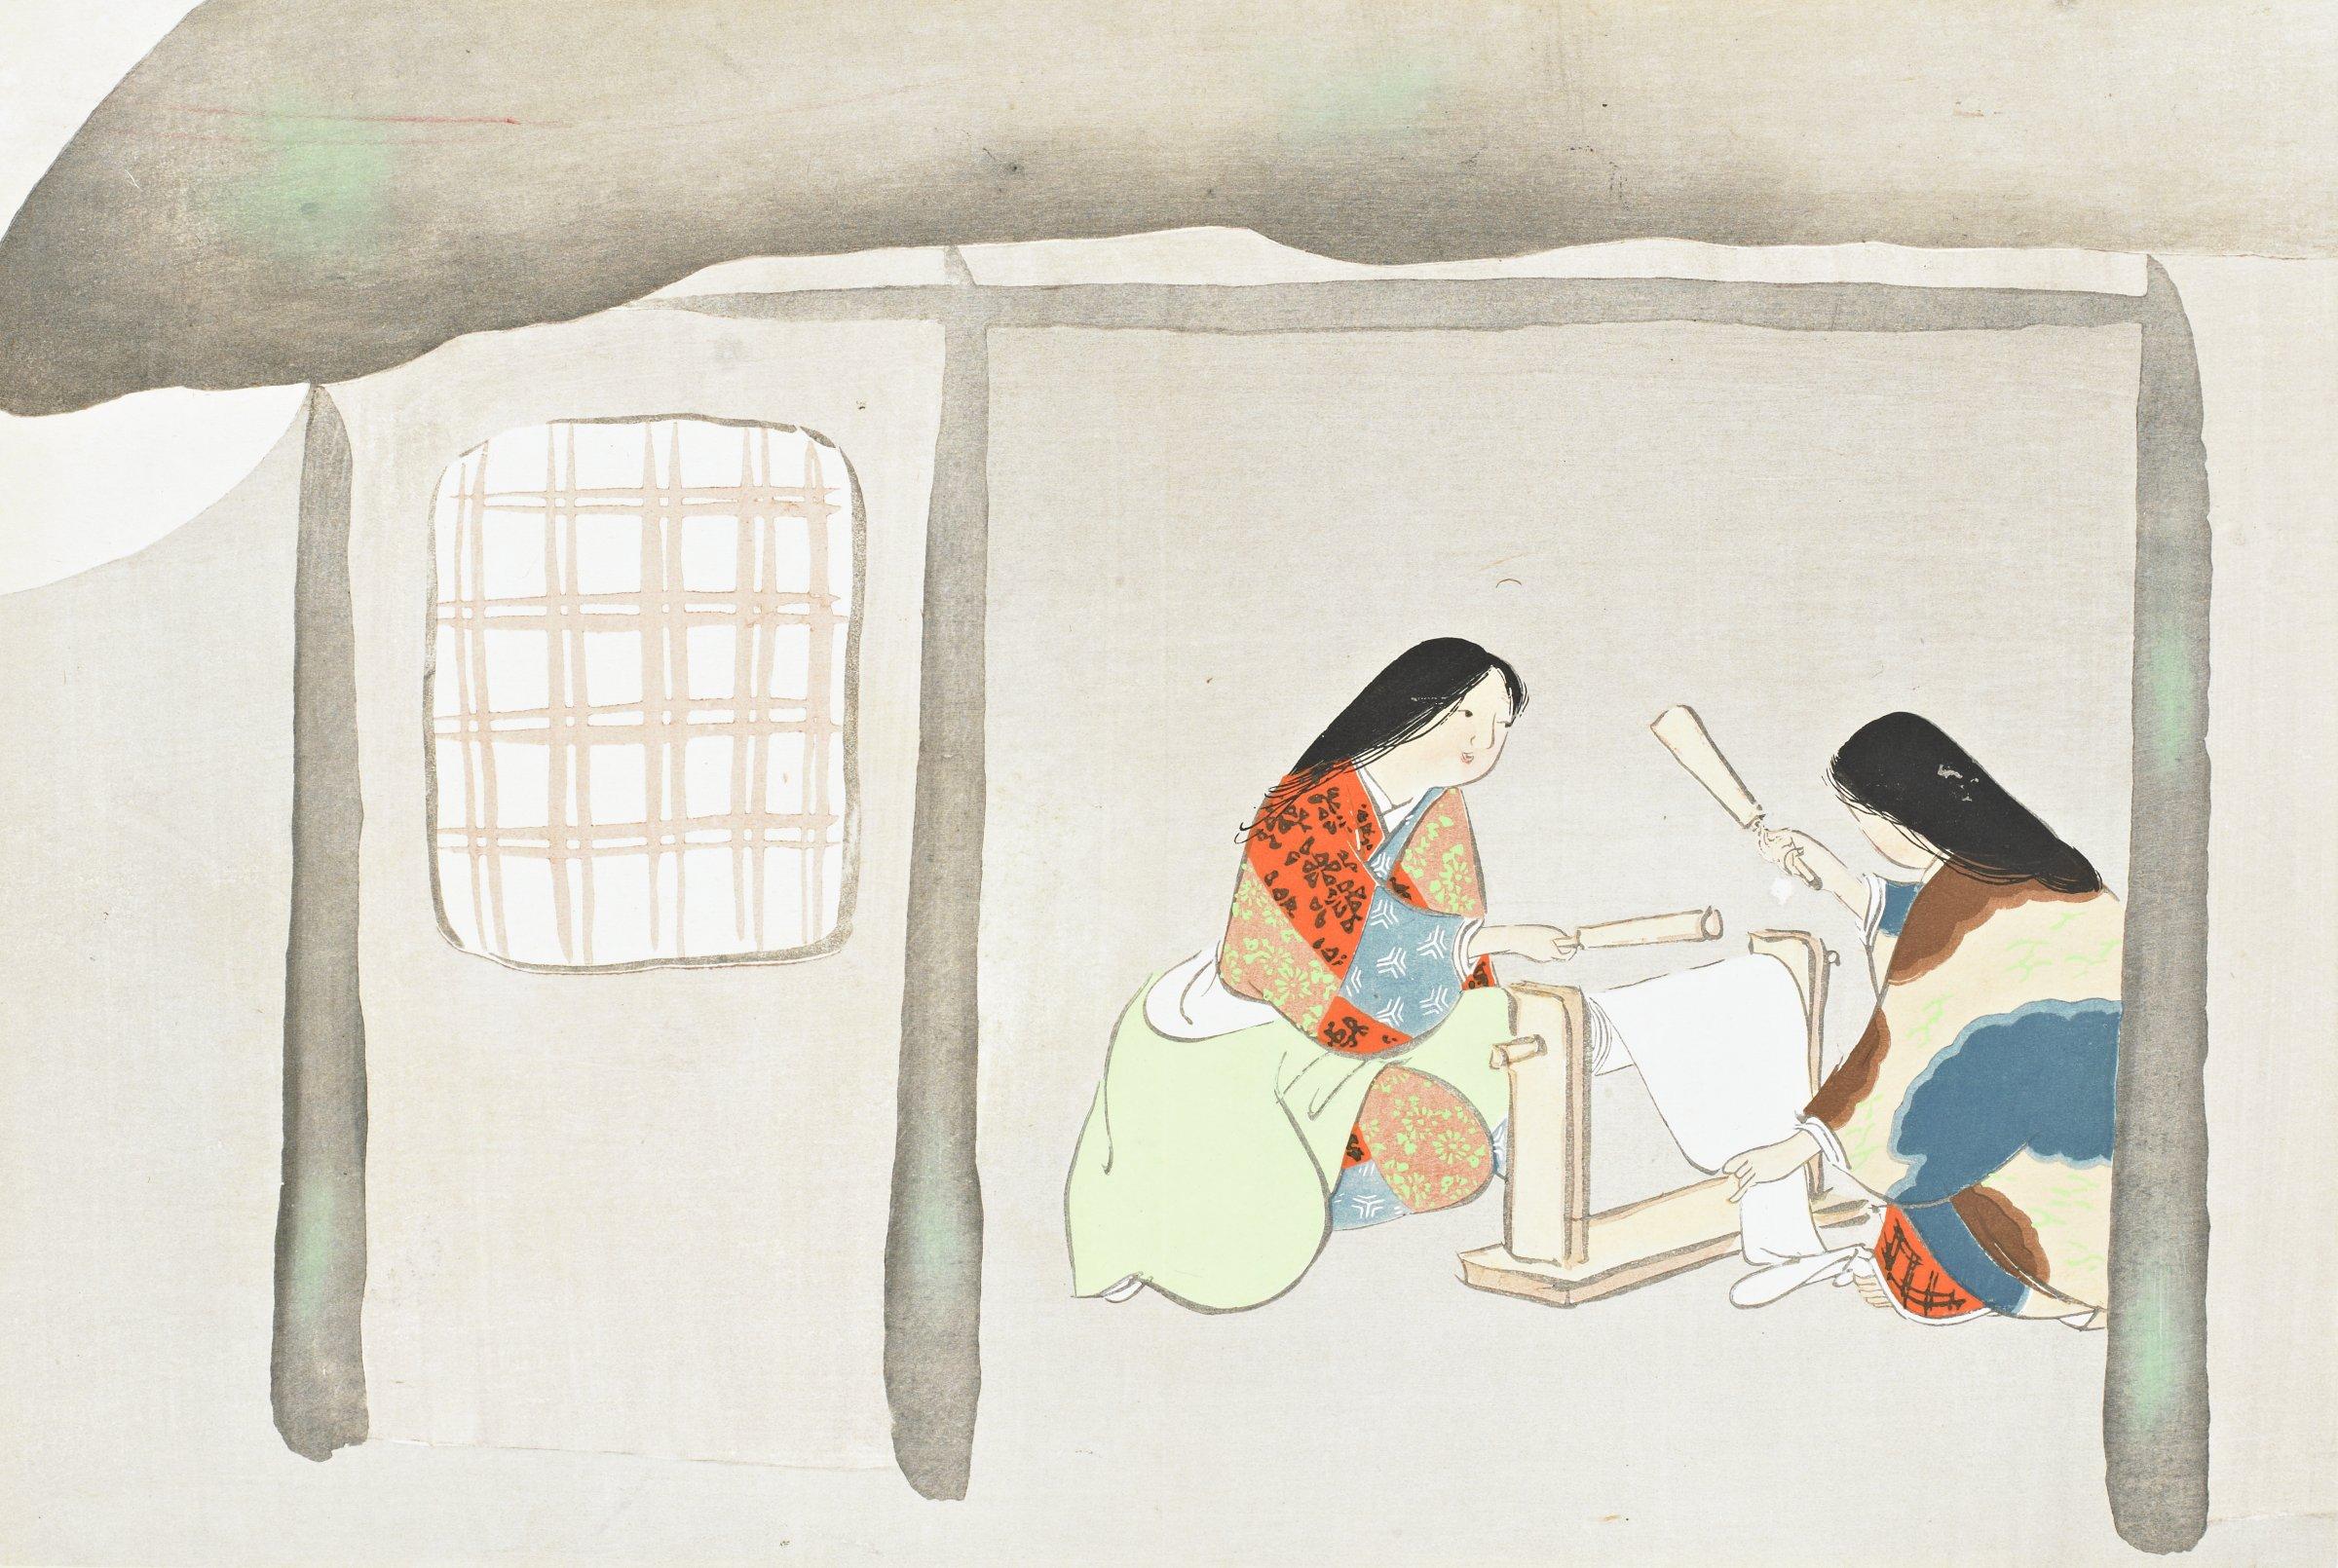 Uchiginu (Striking Silk Fabric on a Fulling Block), from Momoyogusa (A World of Things), Volume 3, Kamisaka Sekka, ink and color on paper